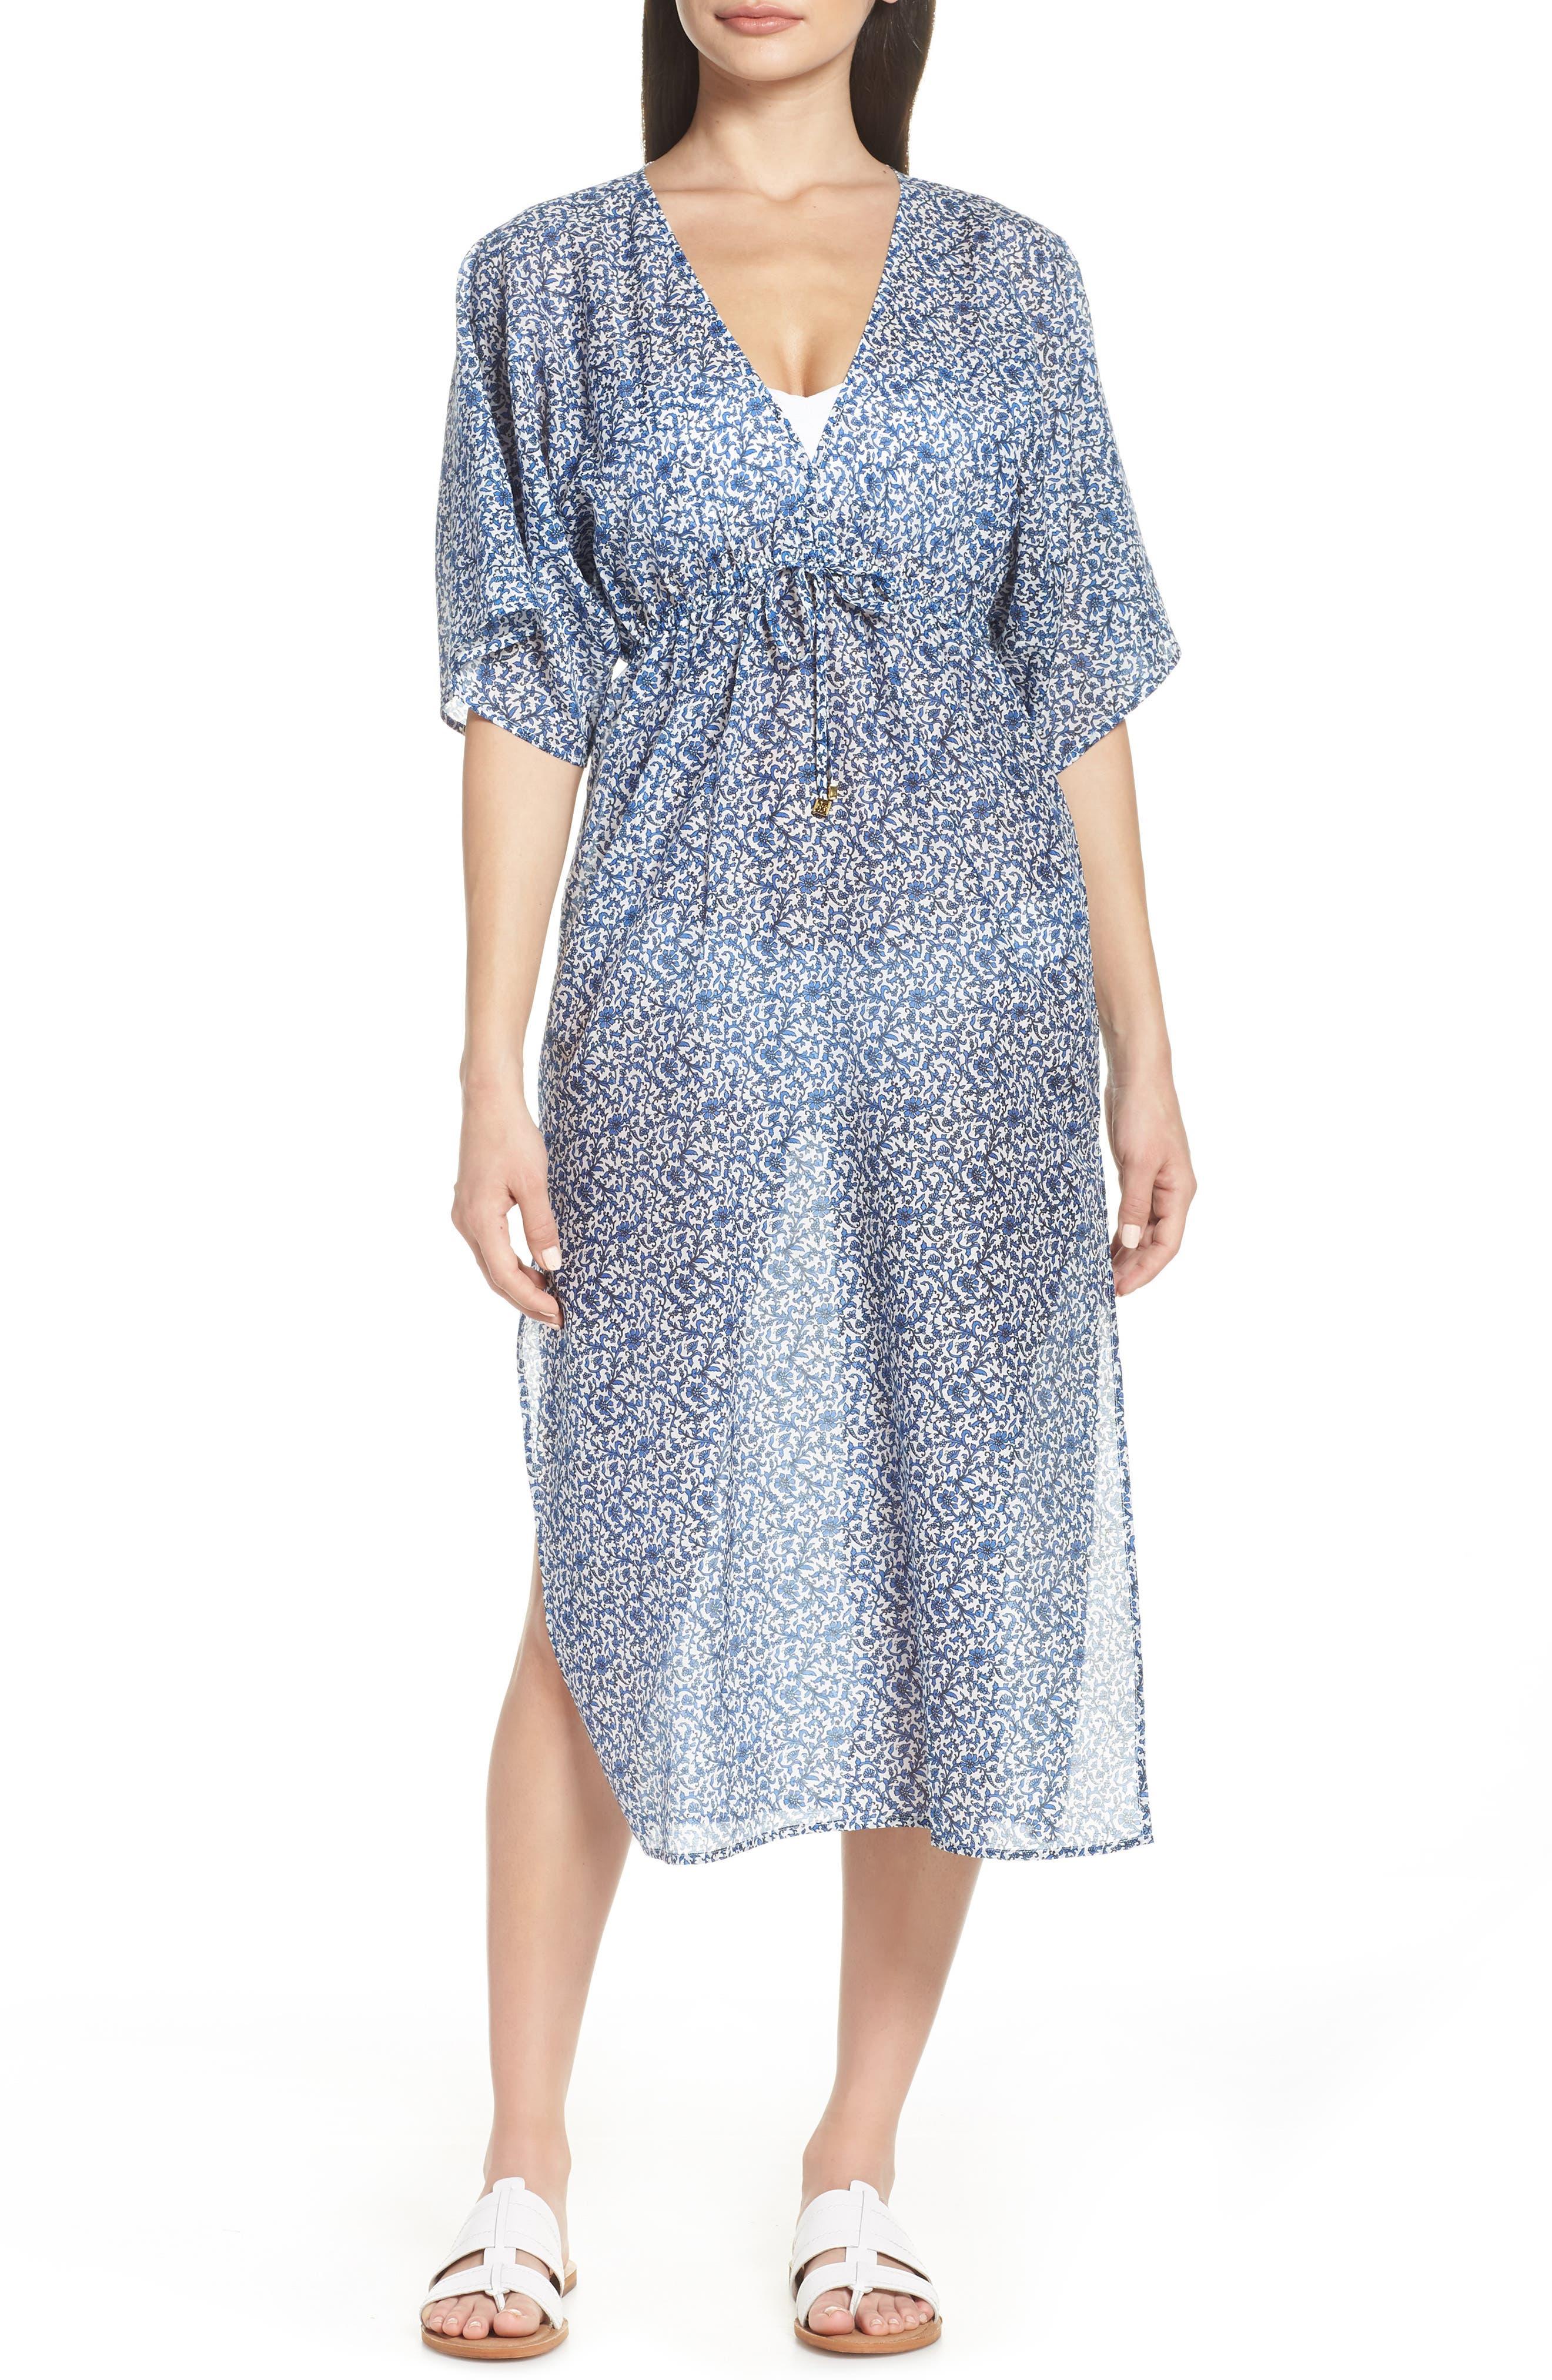 Tory Burch Beach Cover-Up Dress, Blue